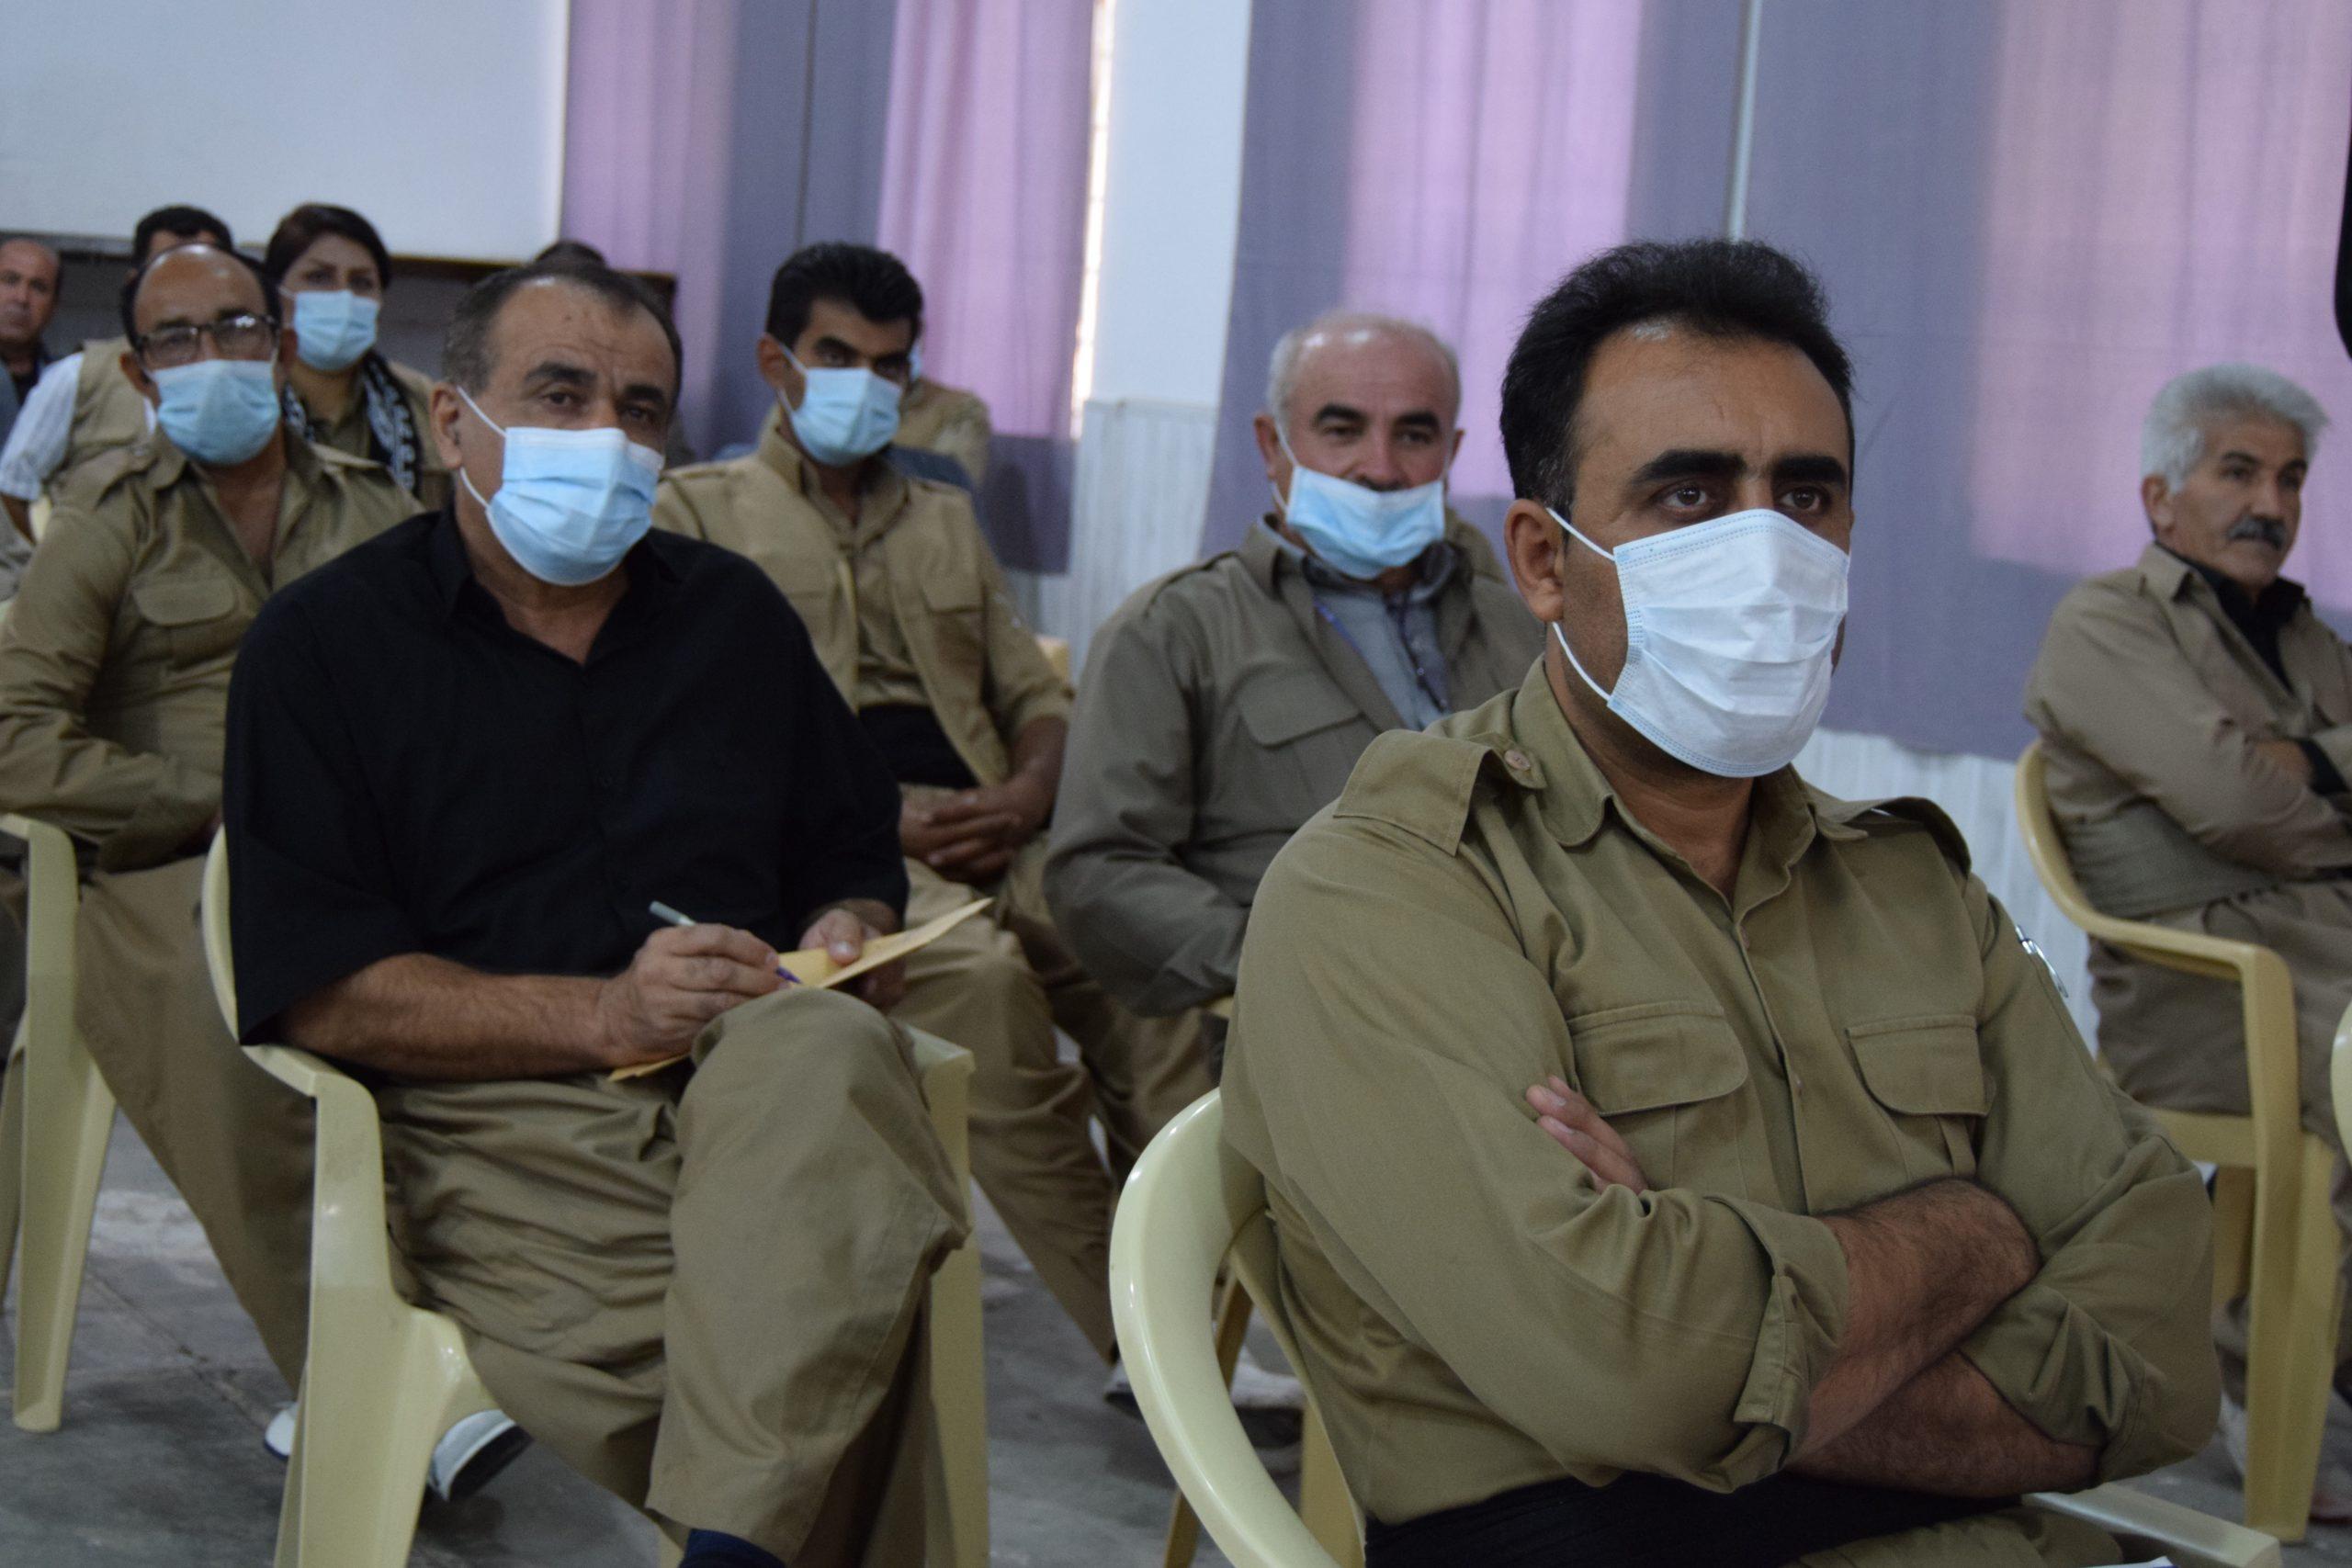 کۆبوونەوەی سیاسی - تەشکیلاتیی بۆ بەڕێز خالید عەزیزی سکرتێری گشتیی حیزبی دێموکراتی کوردستان